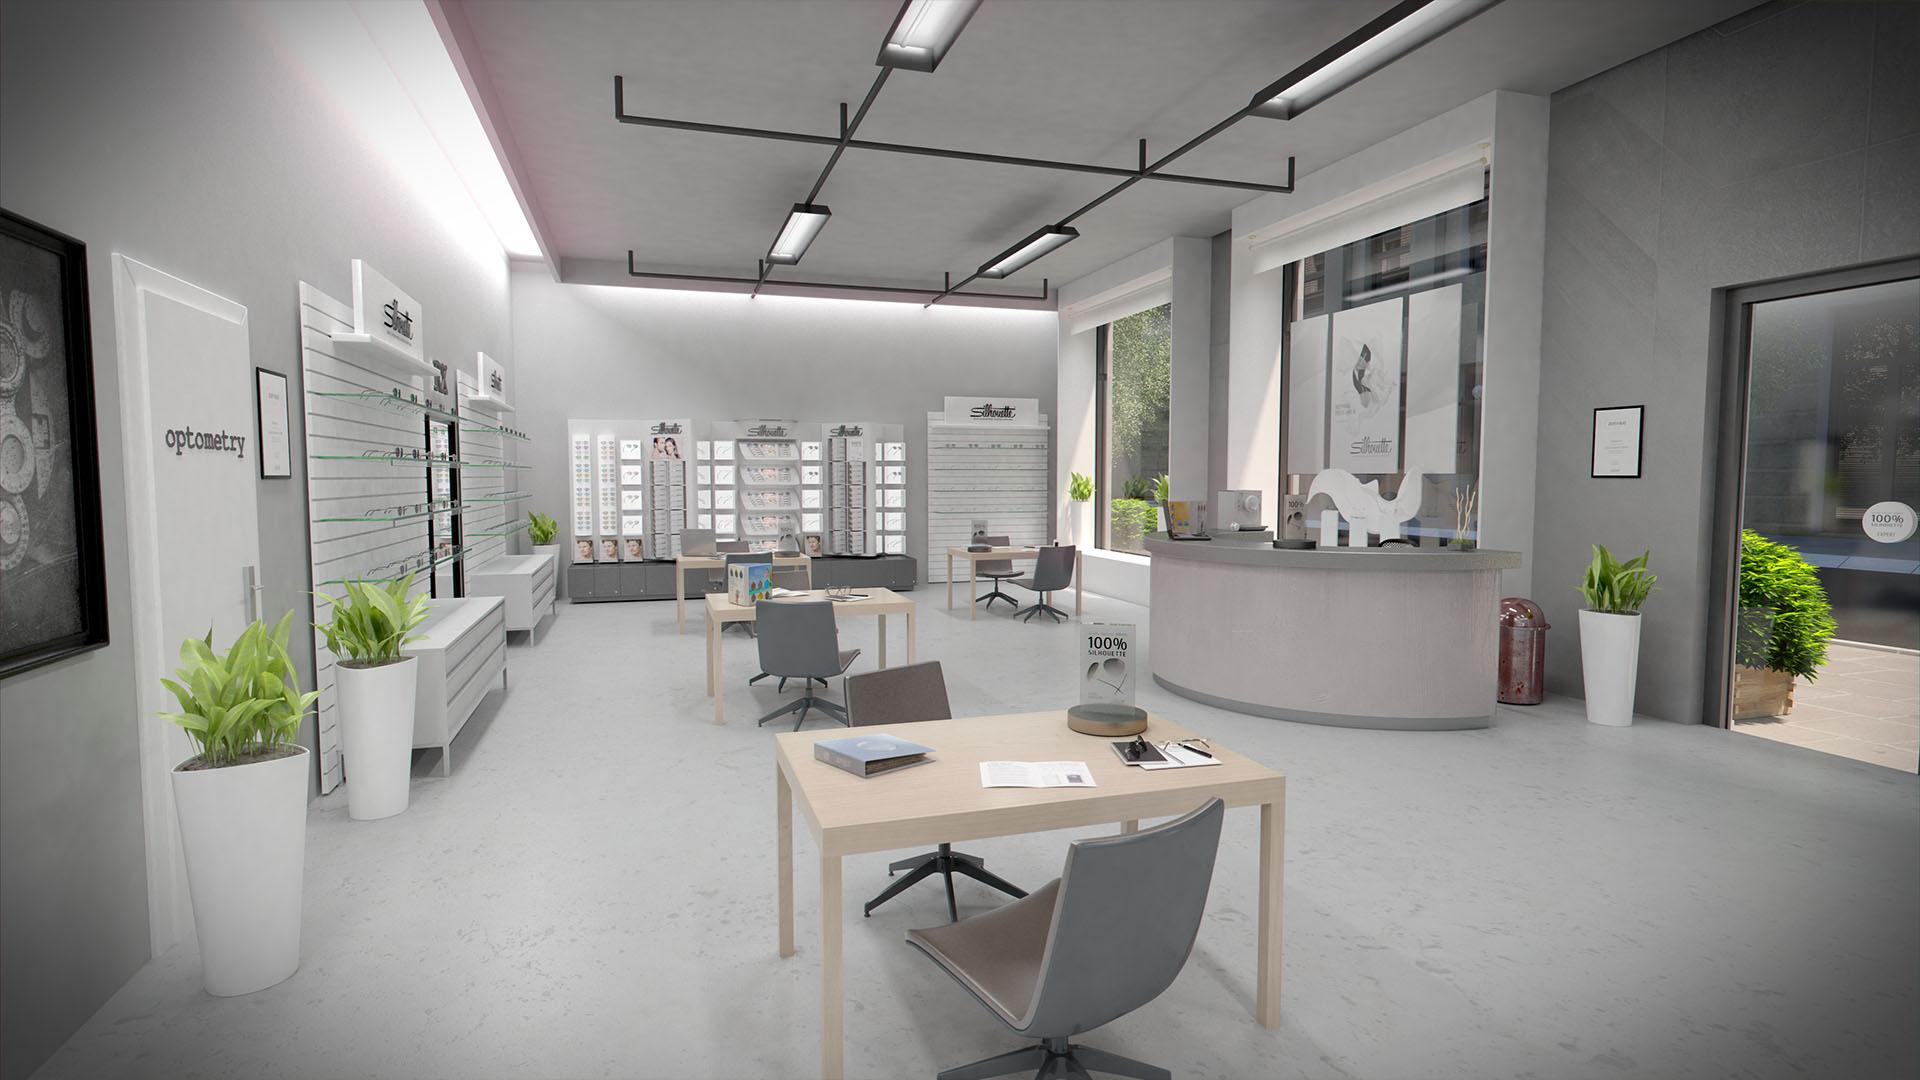 Architektur Rendering Flagship Store Optiker